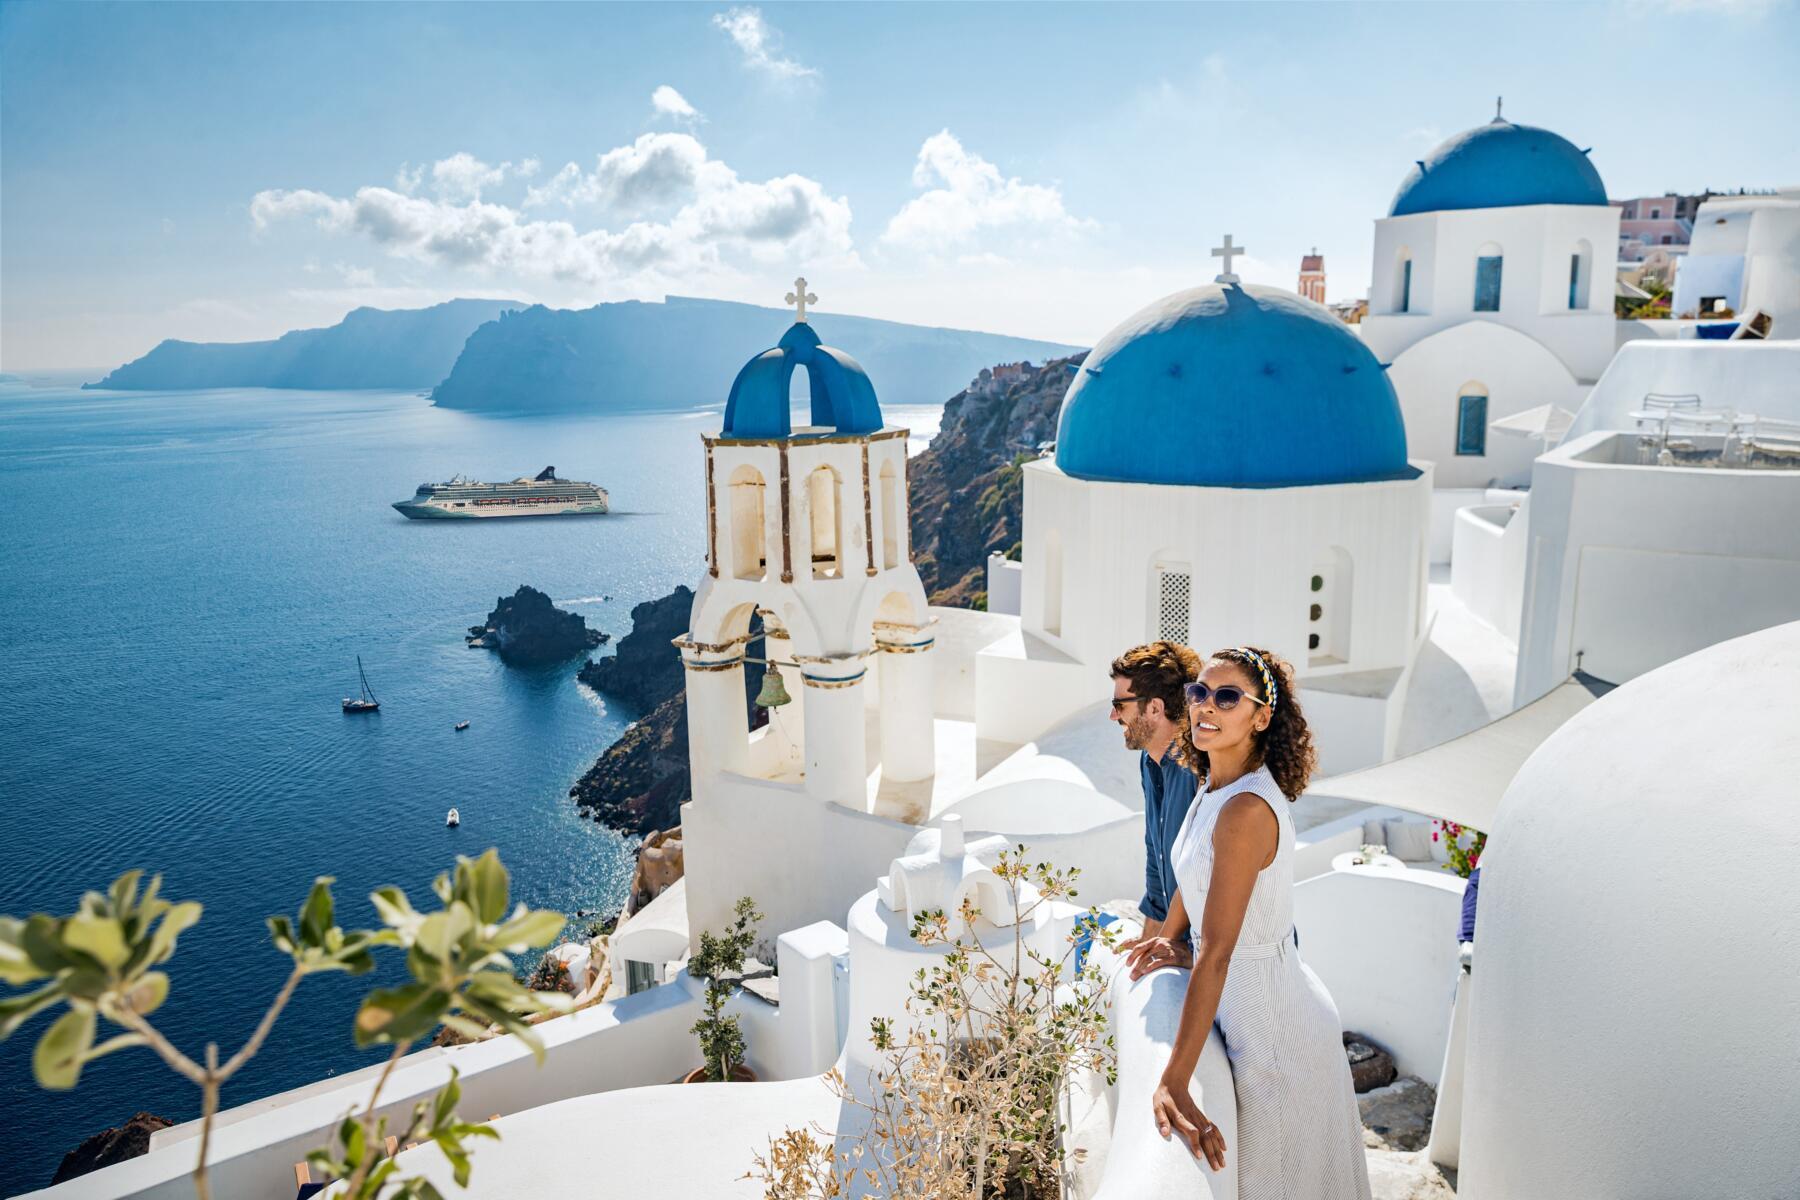 Norwegian Spirit: Kreeka saared, Itaalia, Horvaatia